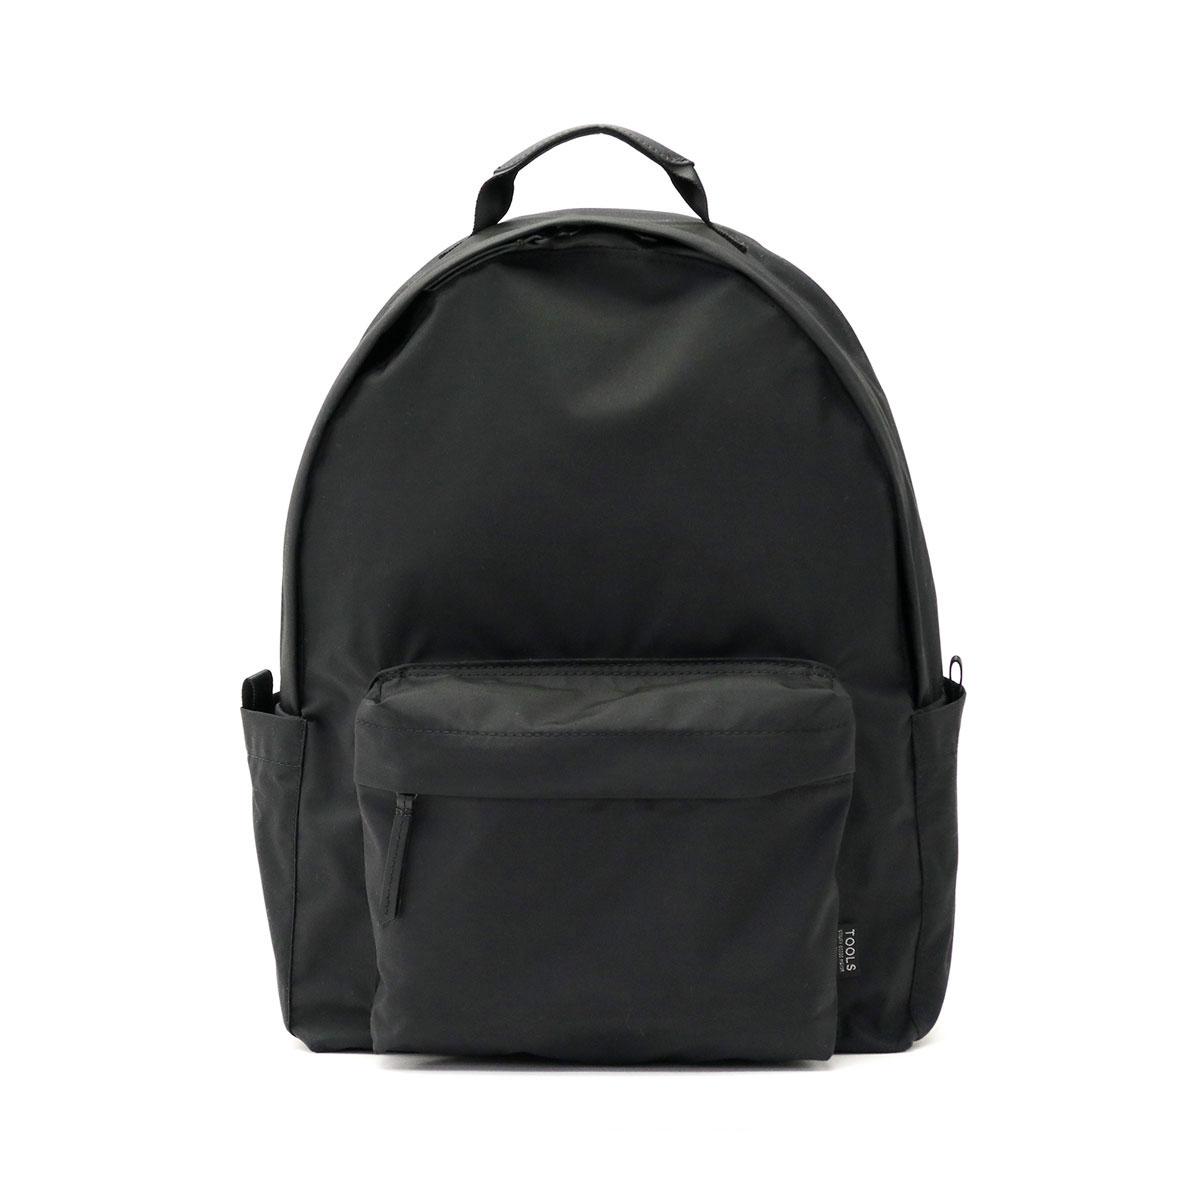 TOOLS ツールズ Daily day pack S デイパック 49T206I